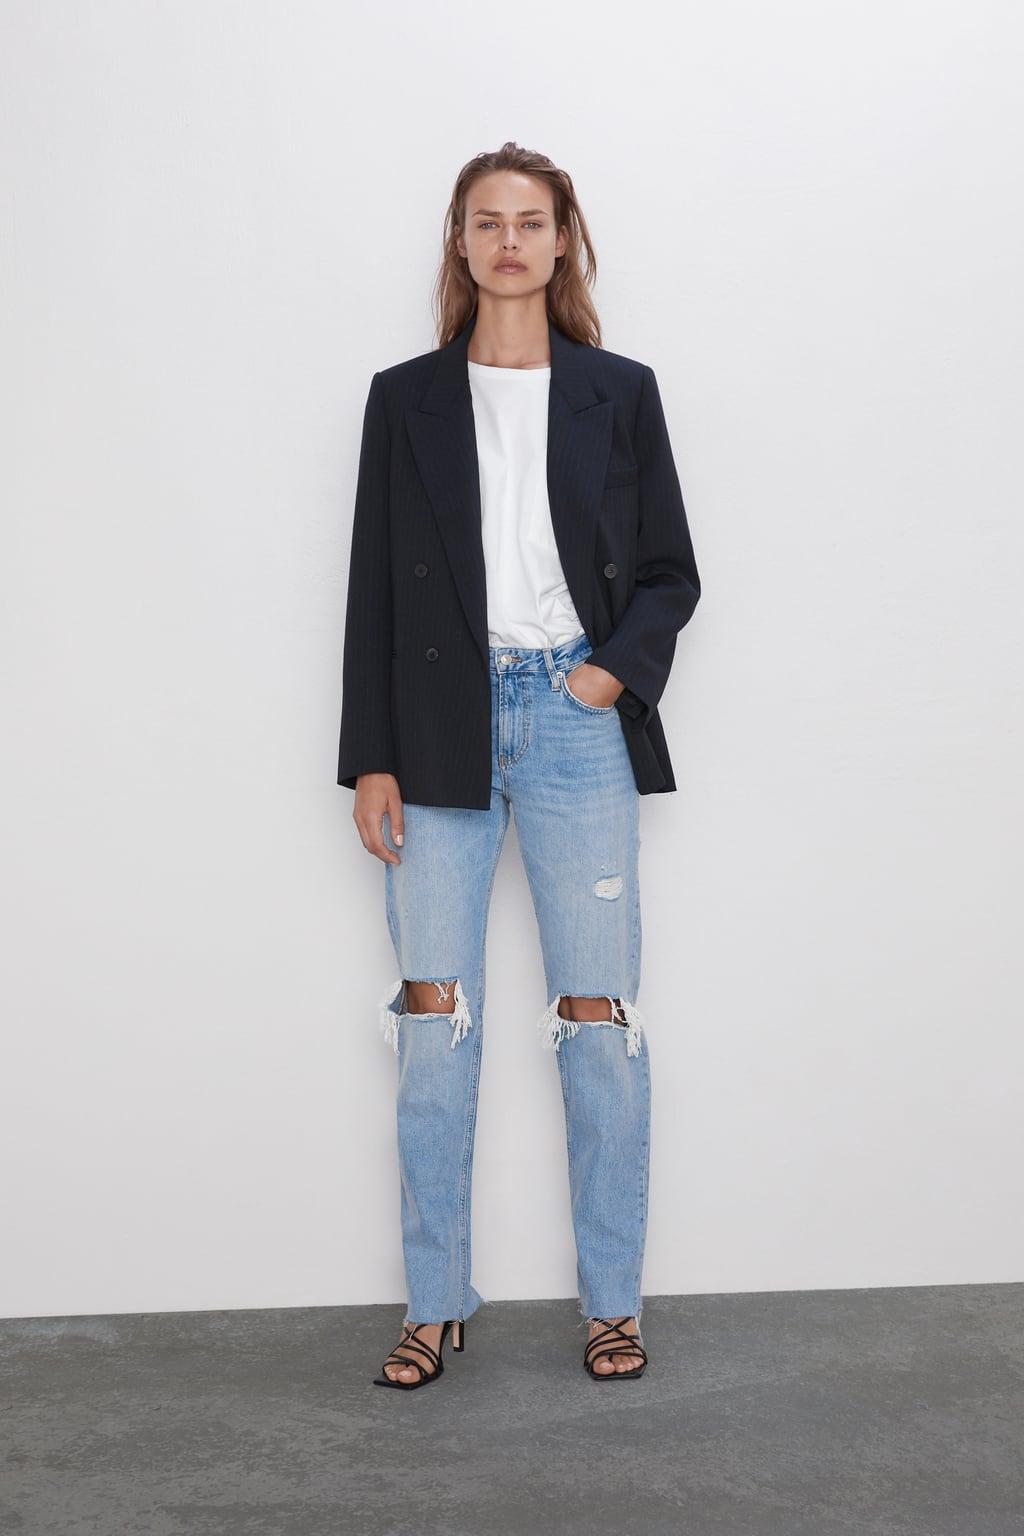 503e8b42 Women's Blazers | New Collection Online | ZARA Ireland